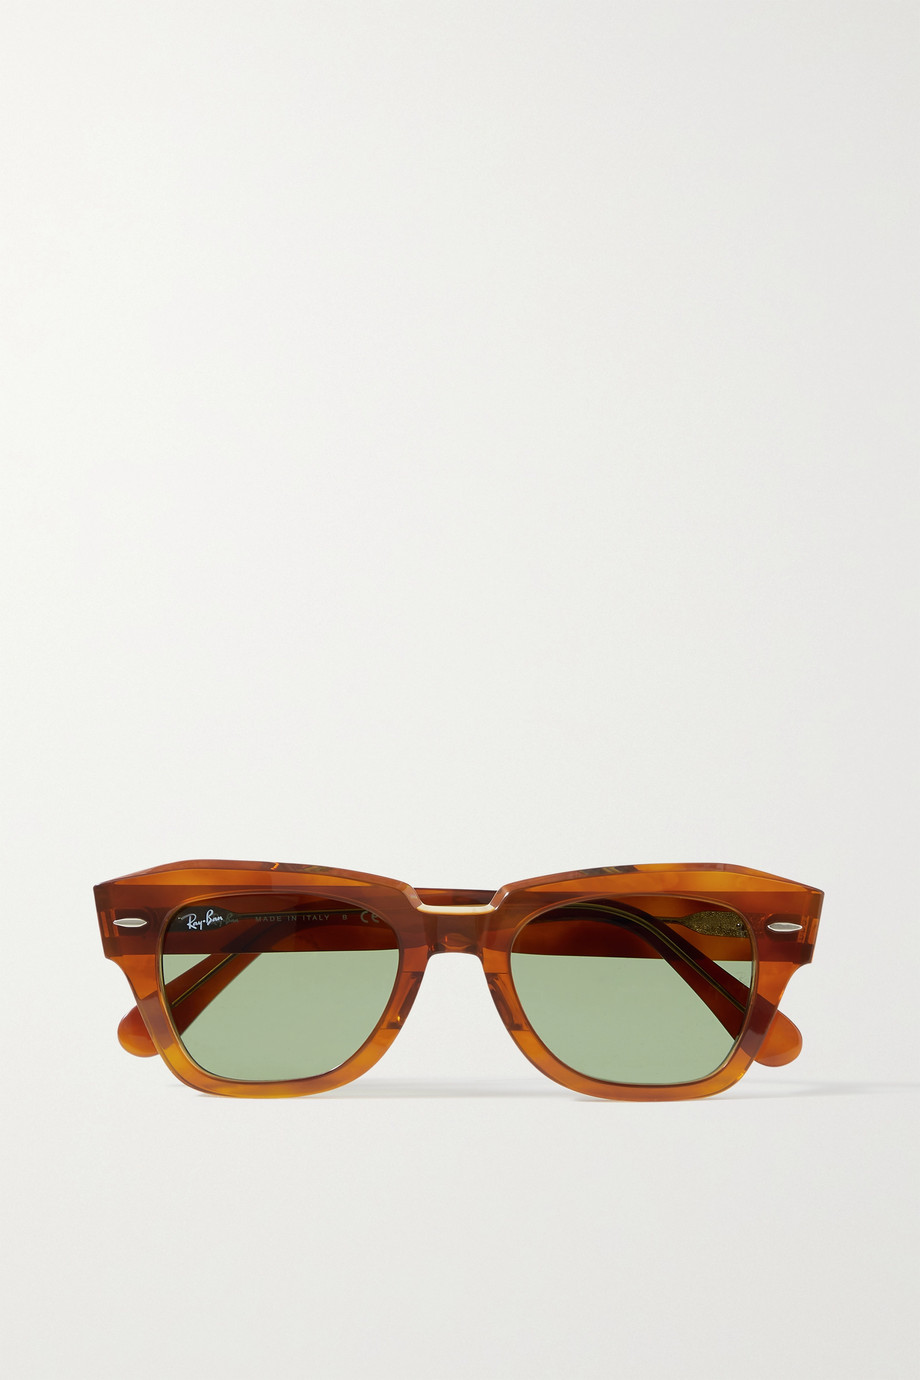 Ray-Ban State Street square-frame tortoiseshell acetate sunglasses